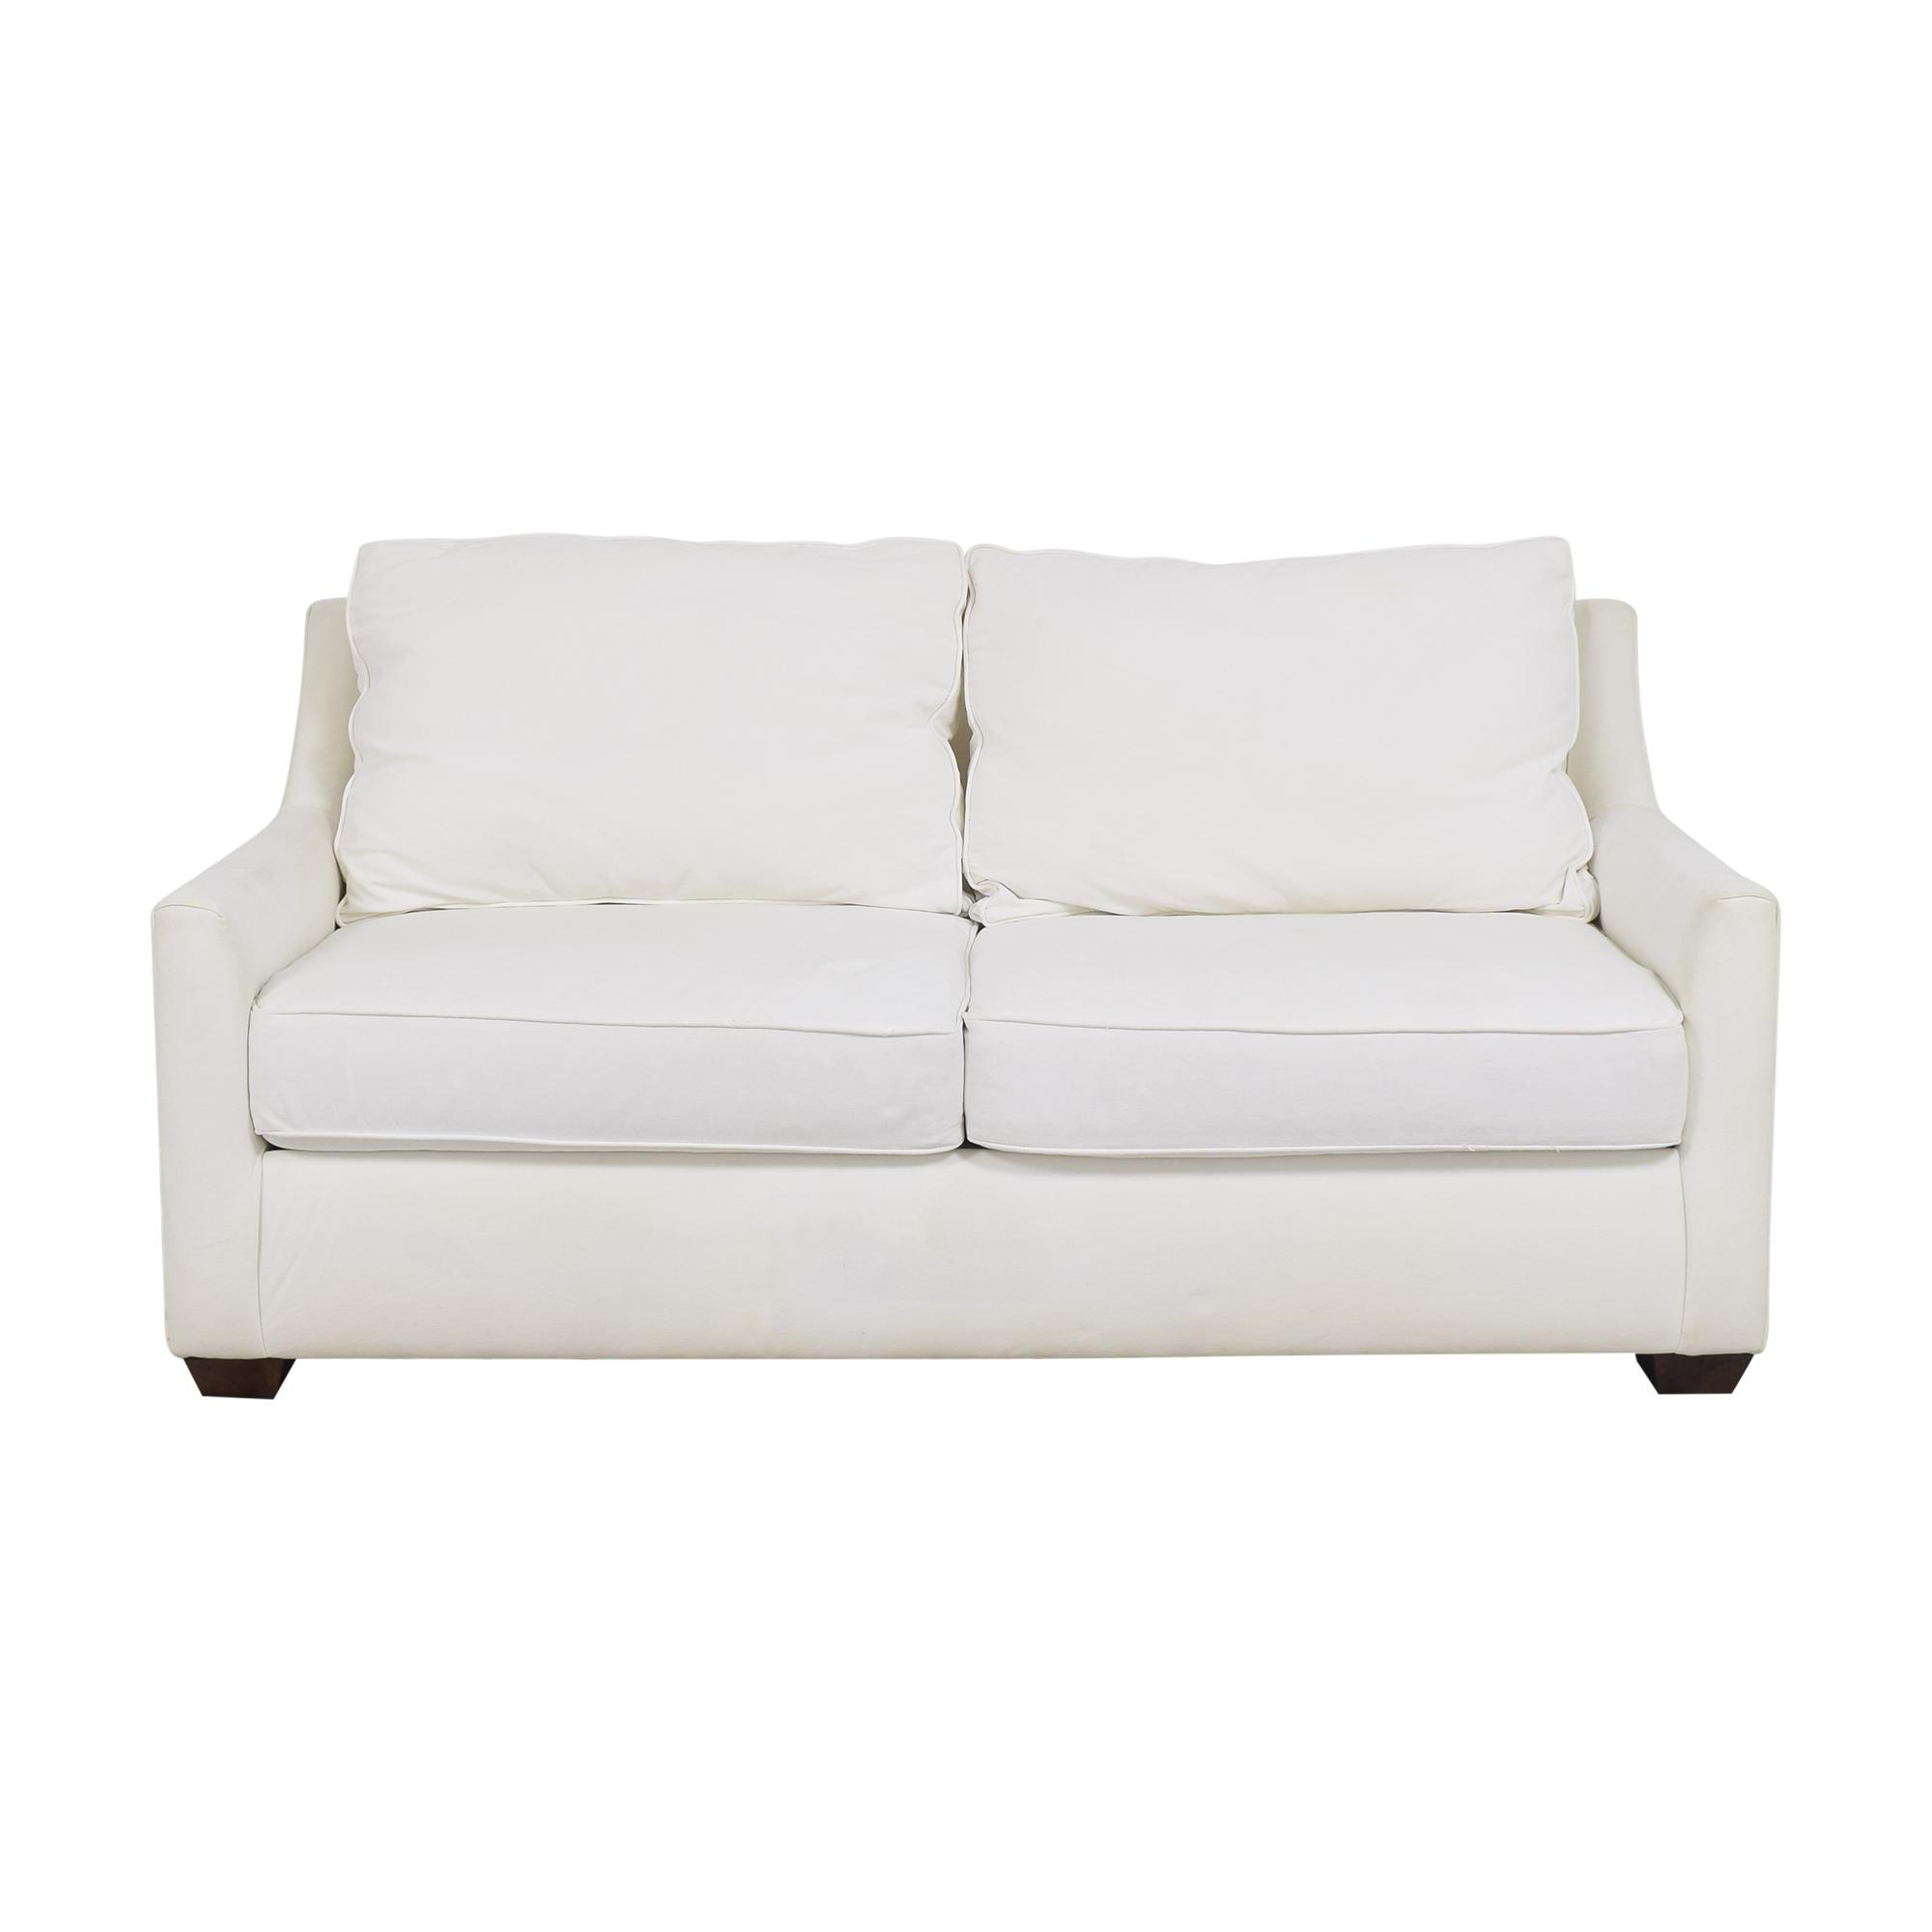 KFI KFI Two Cushion Sofa white